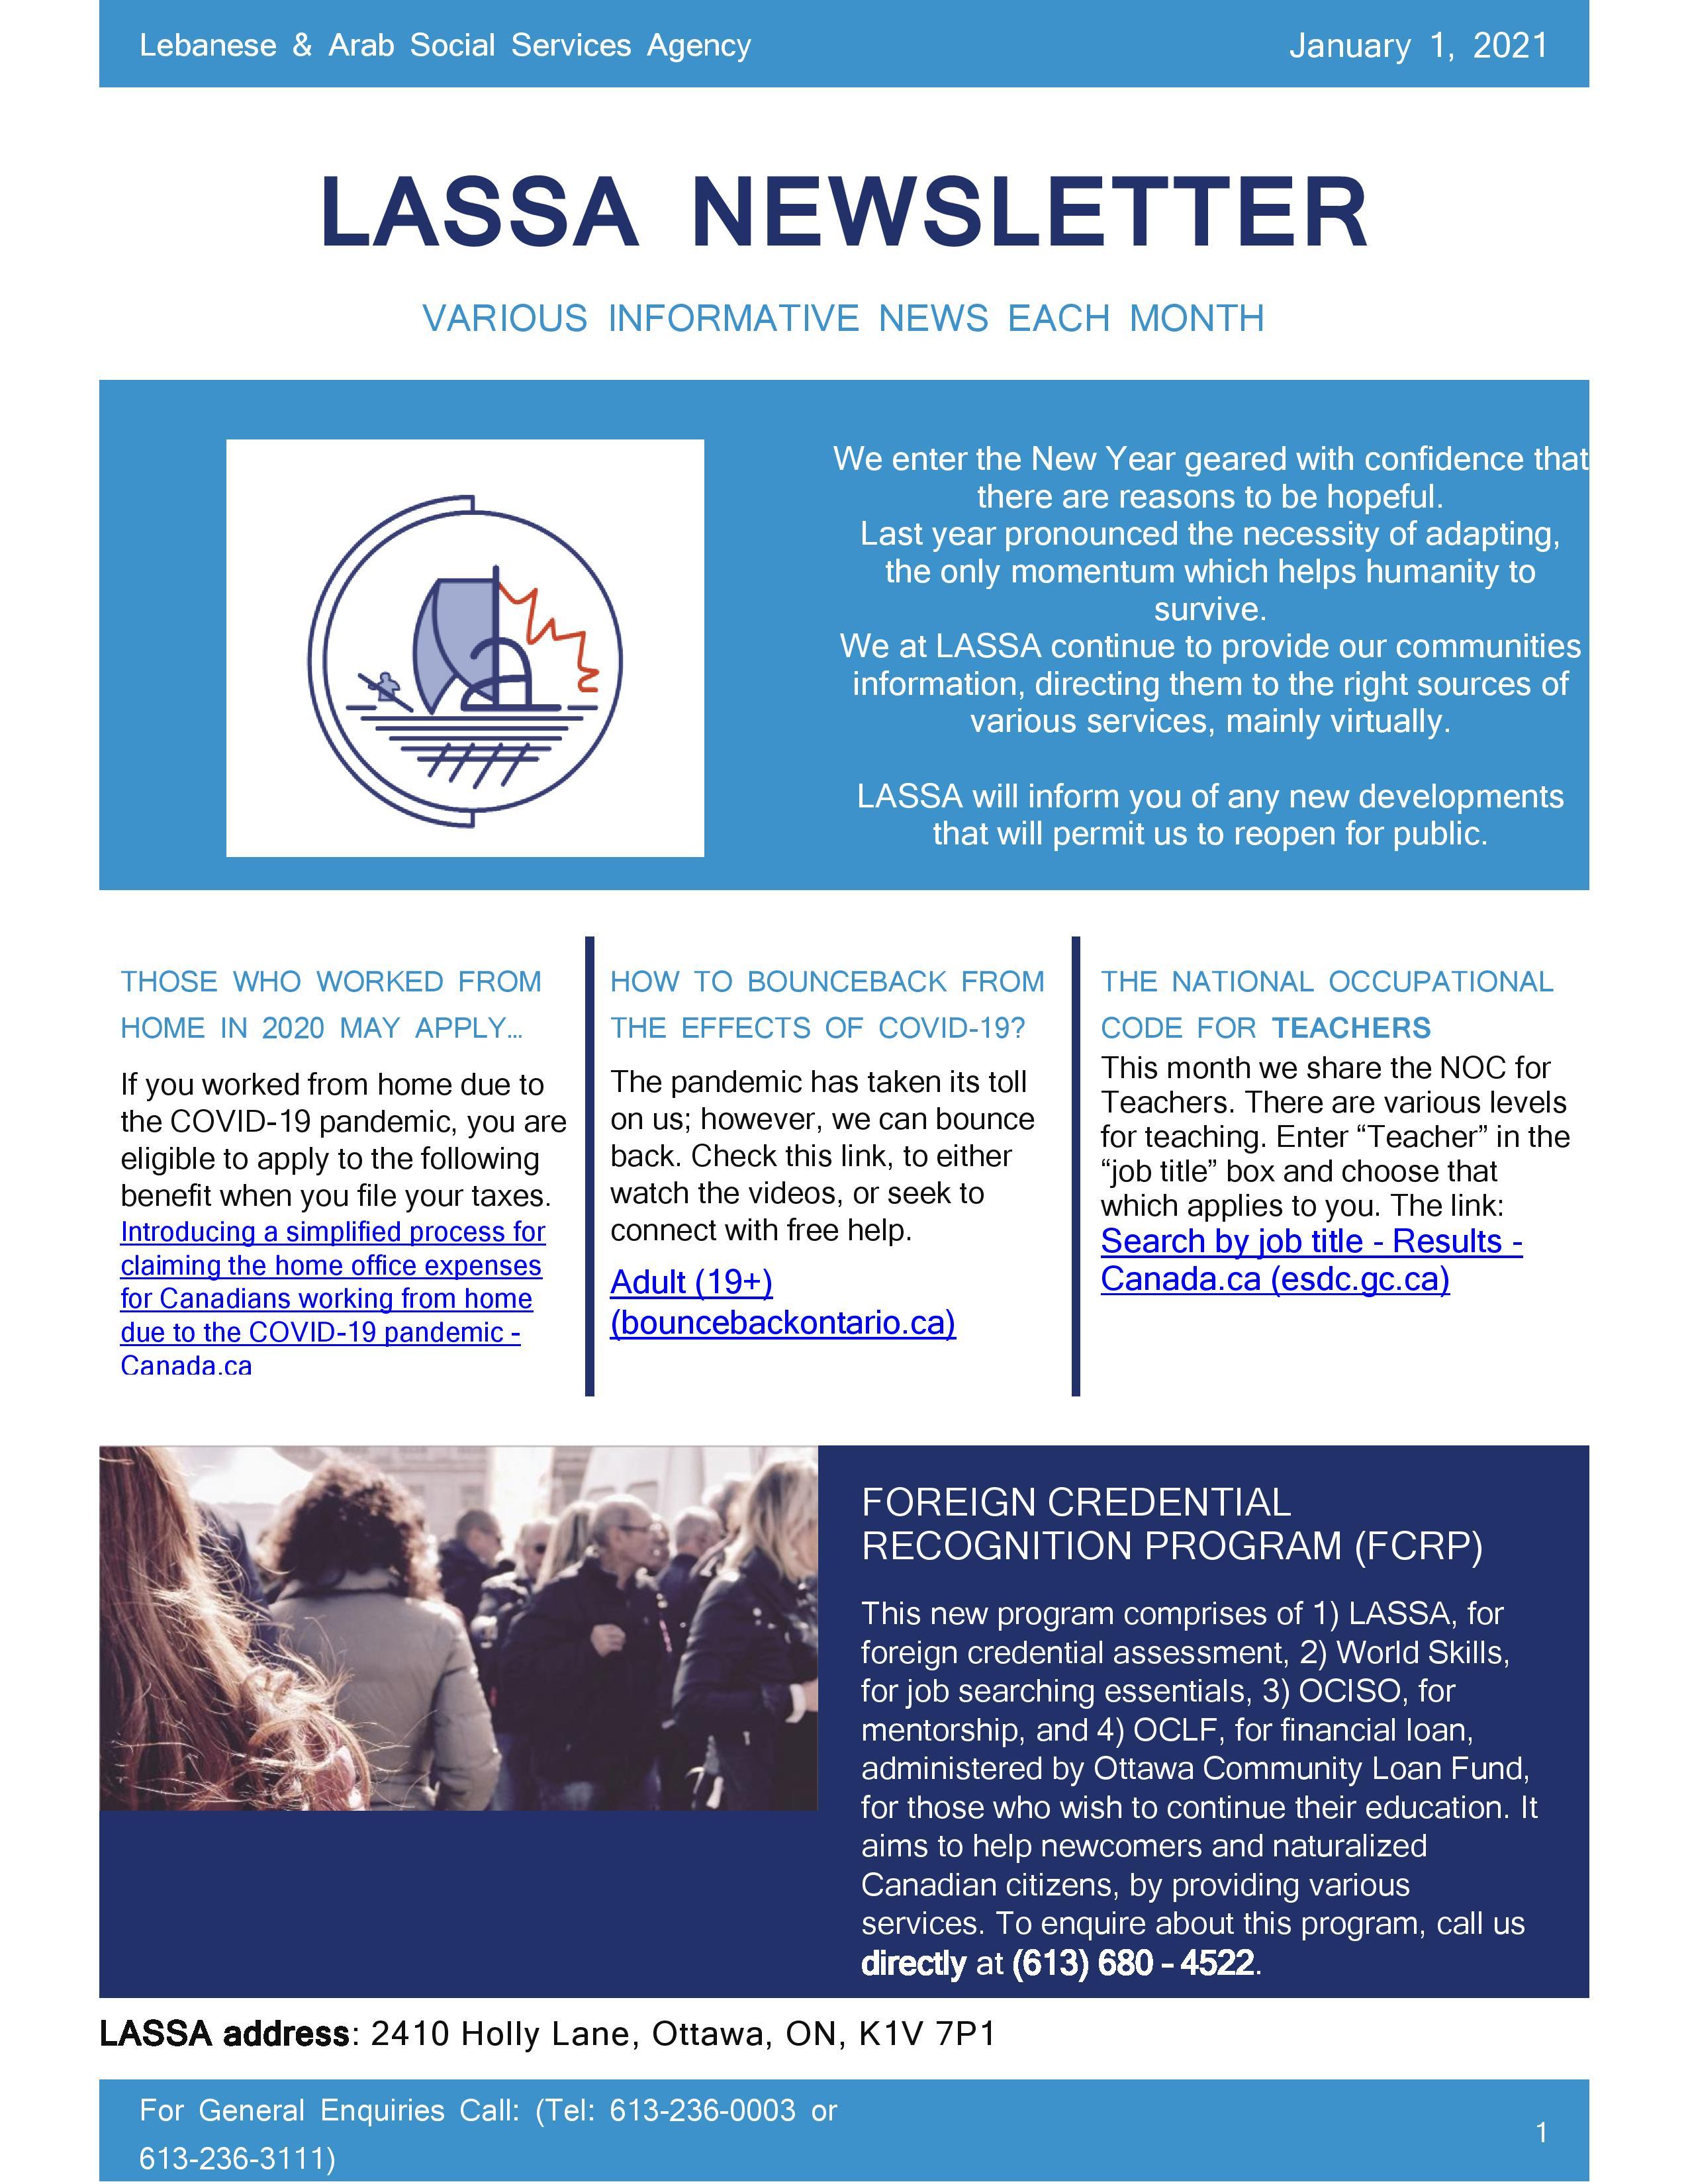 LASSA-NEWSLETTER_January-2021-page-001